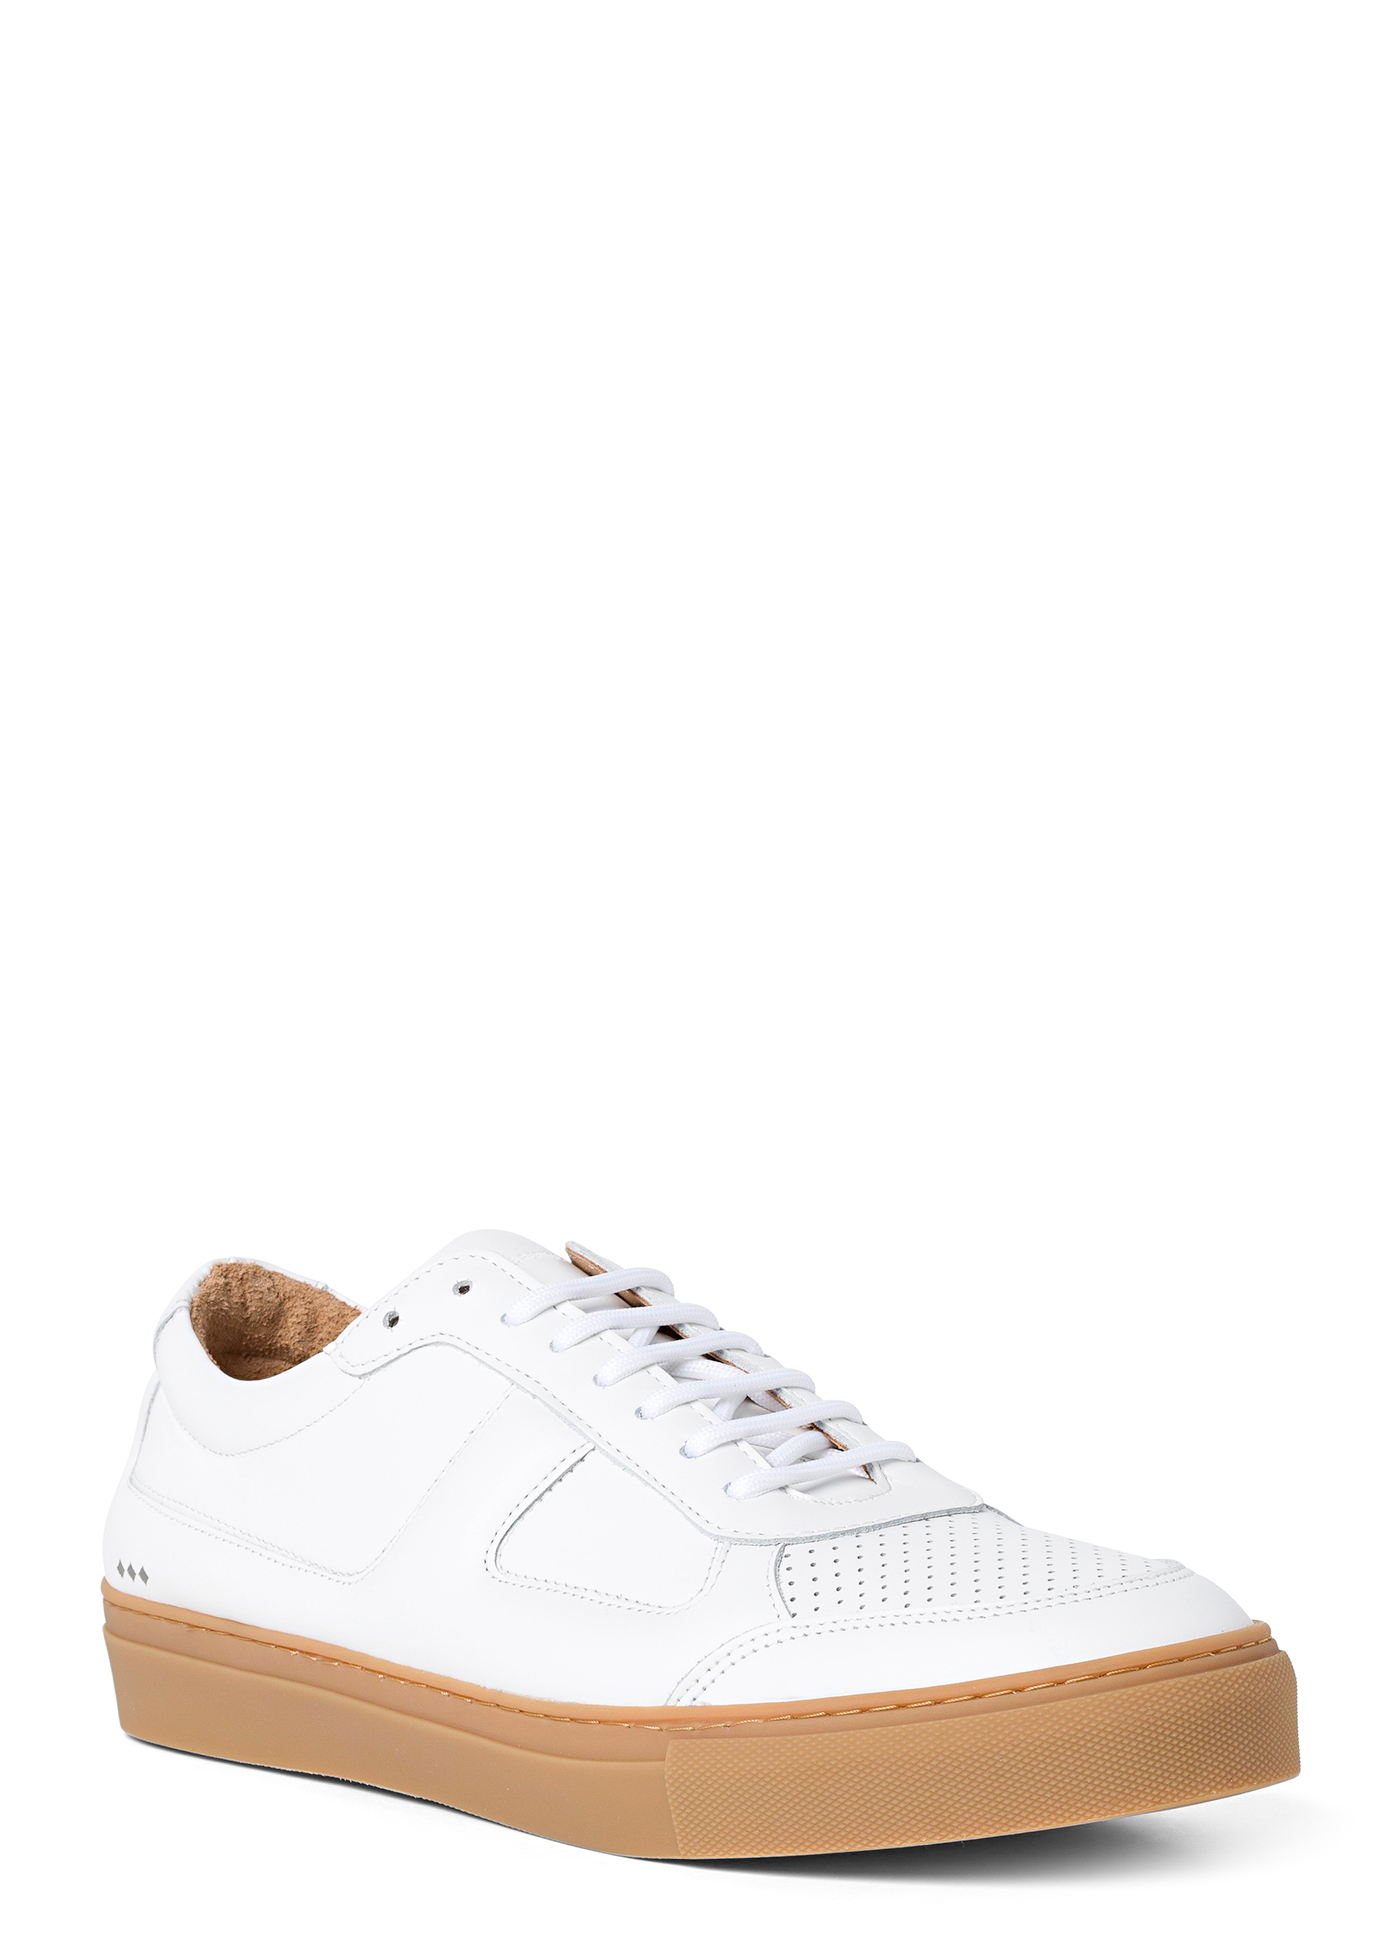 Spartacus Tennis Shoe 215 image number 1